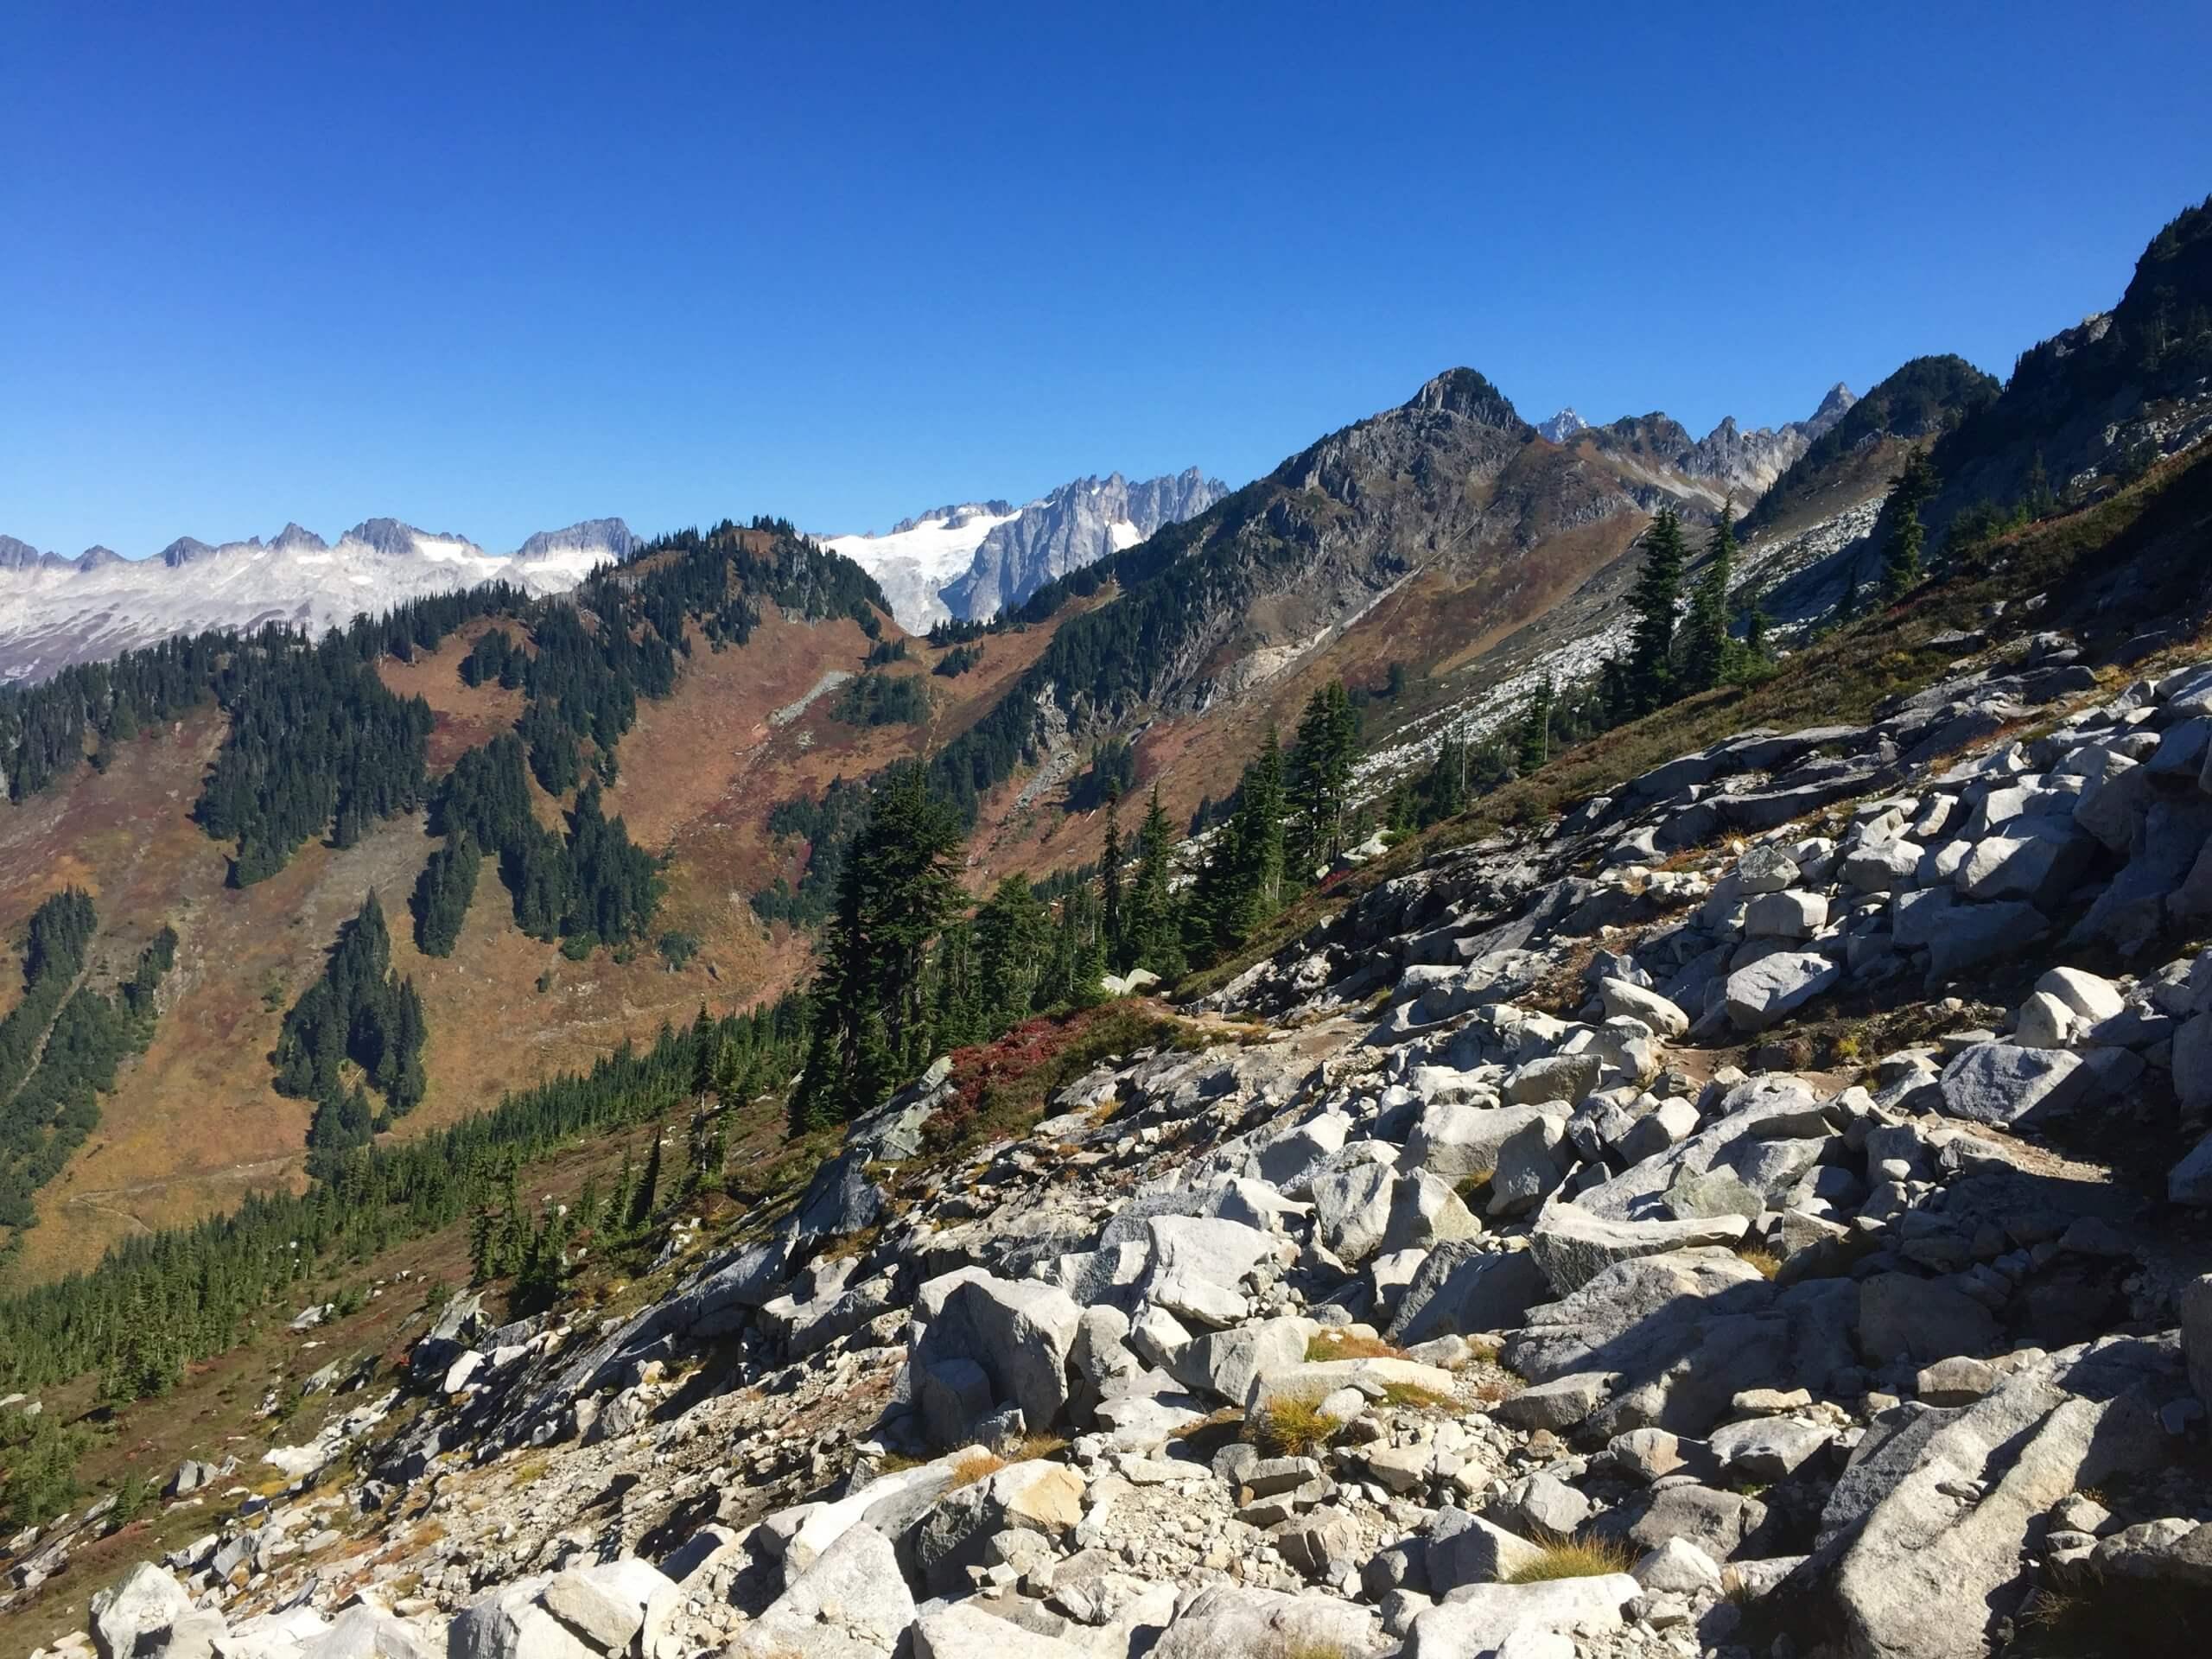 A talus slope along the Hidden Lake Trail